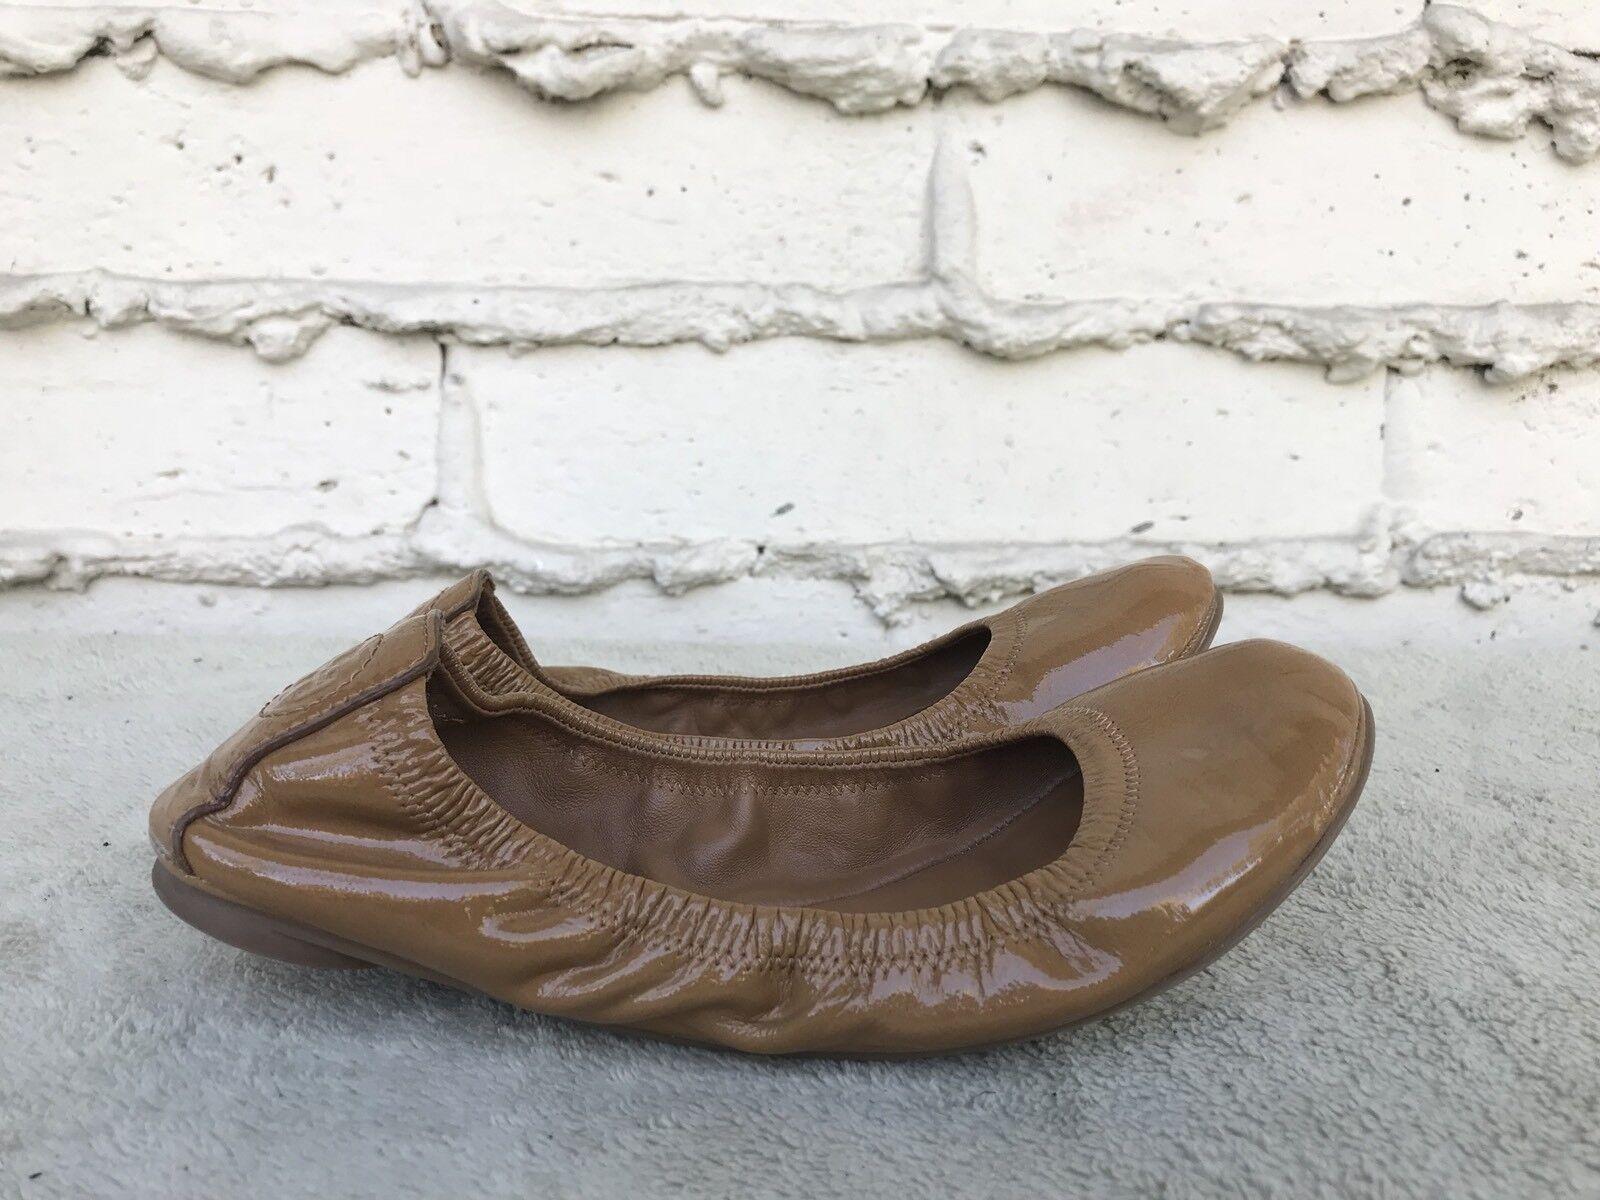 EUC Tory Burch EDDIE Tan Patent Leather Slip on Ballet Flats Women Size US 6 M